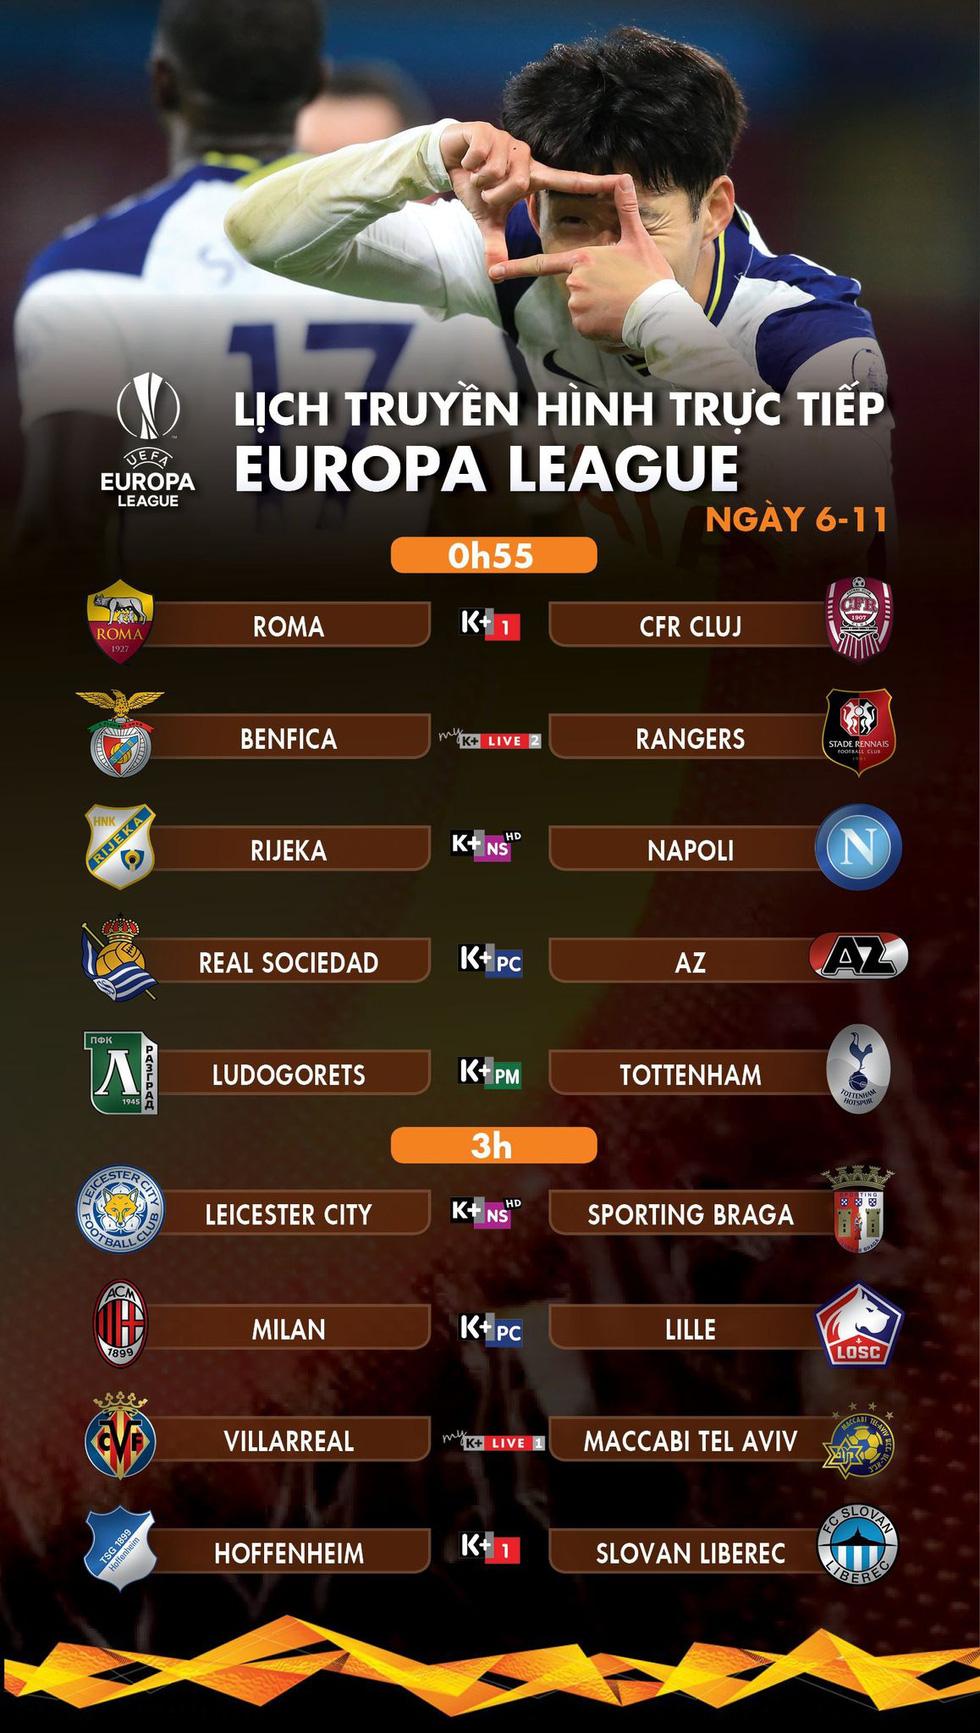 Lịch trực tiếp Europa League: Tottenham trở lại mạch thắng? - Ảnh 1.